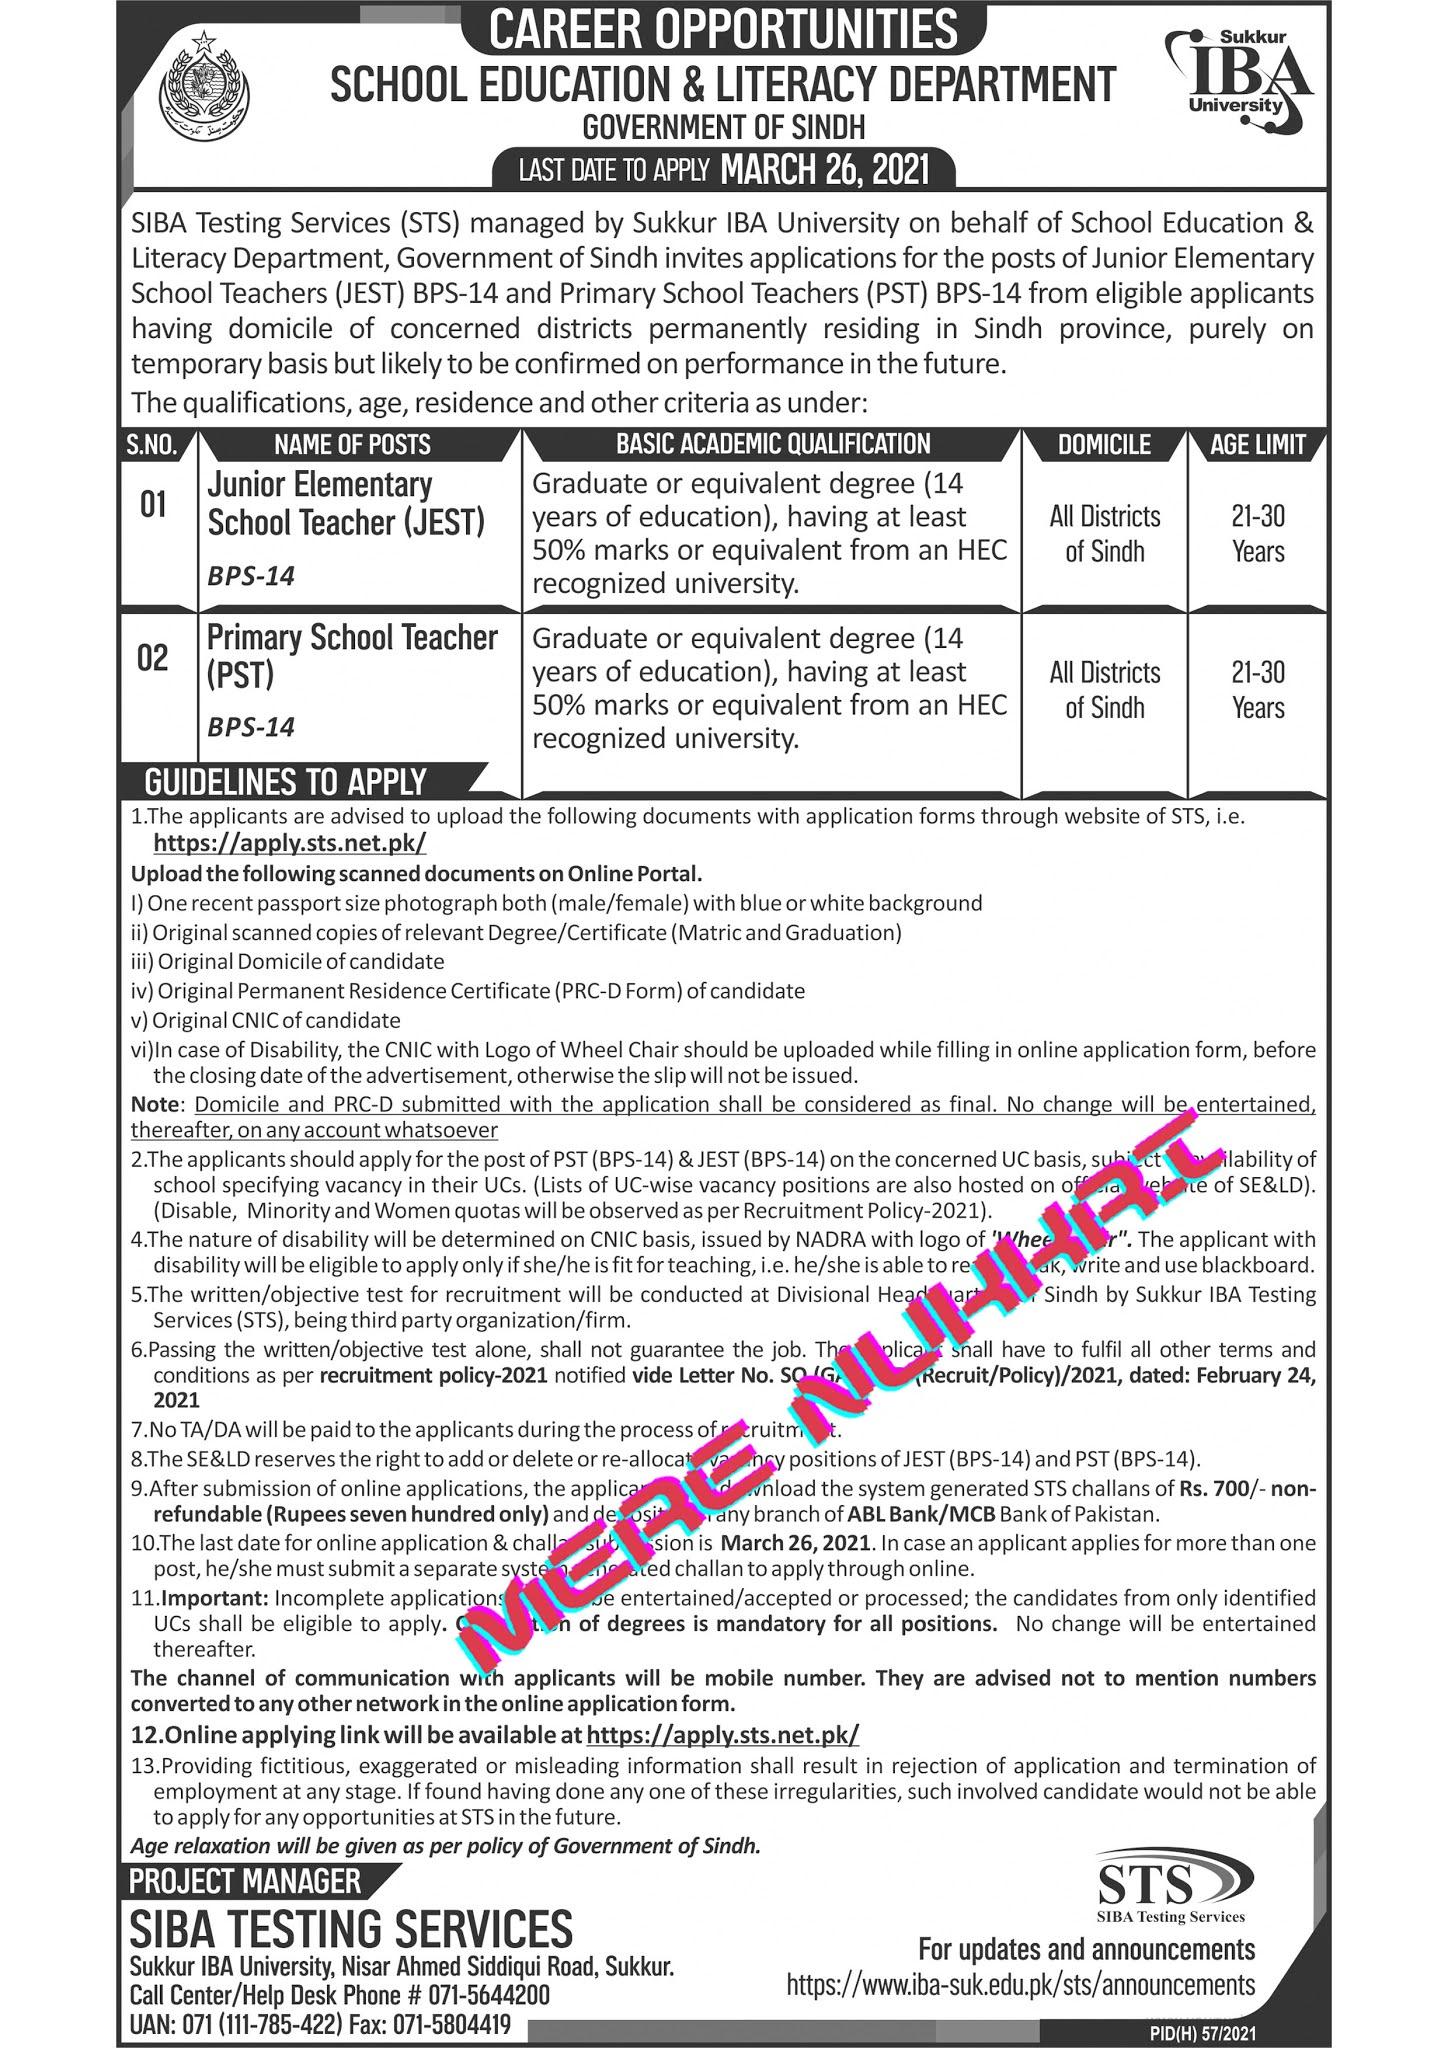 PST JEST School Teachers Jobs 2021 Apply Online   IBA University   School Education & Literacy Department